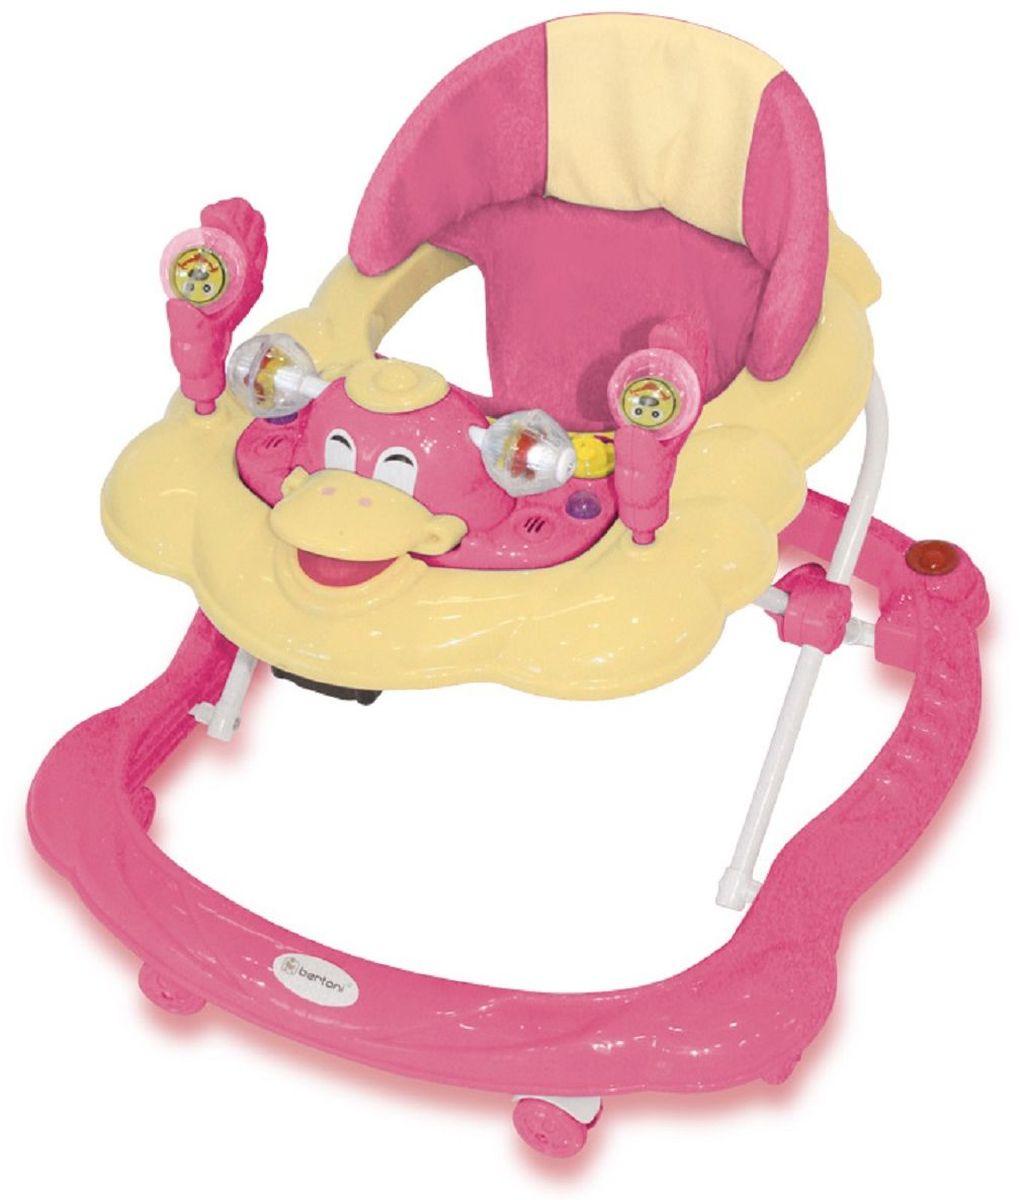 Bertoni Ходунки BW 10 цвет розовый желтый - Ходунки, прыгунки, качалки